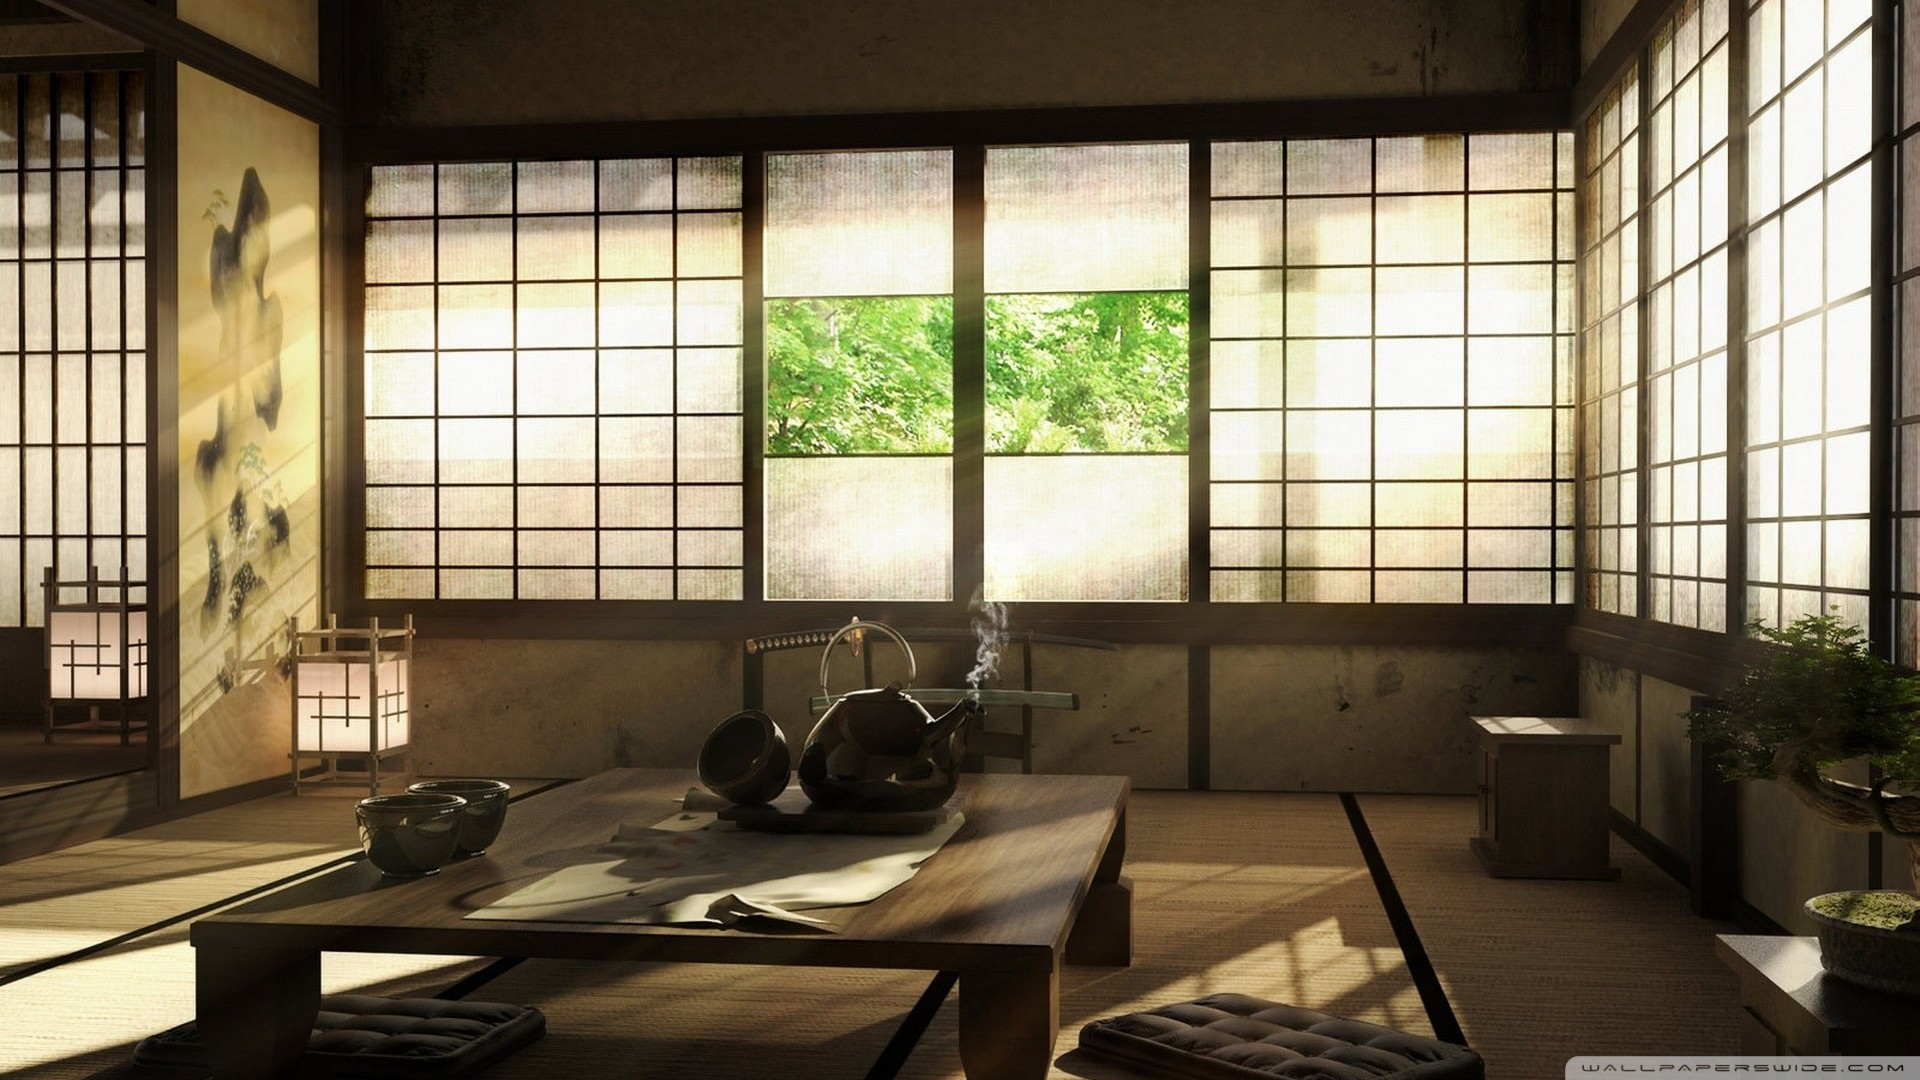 japan_room-wallpaper-1920x1080.jpg